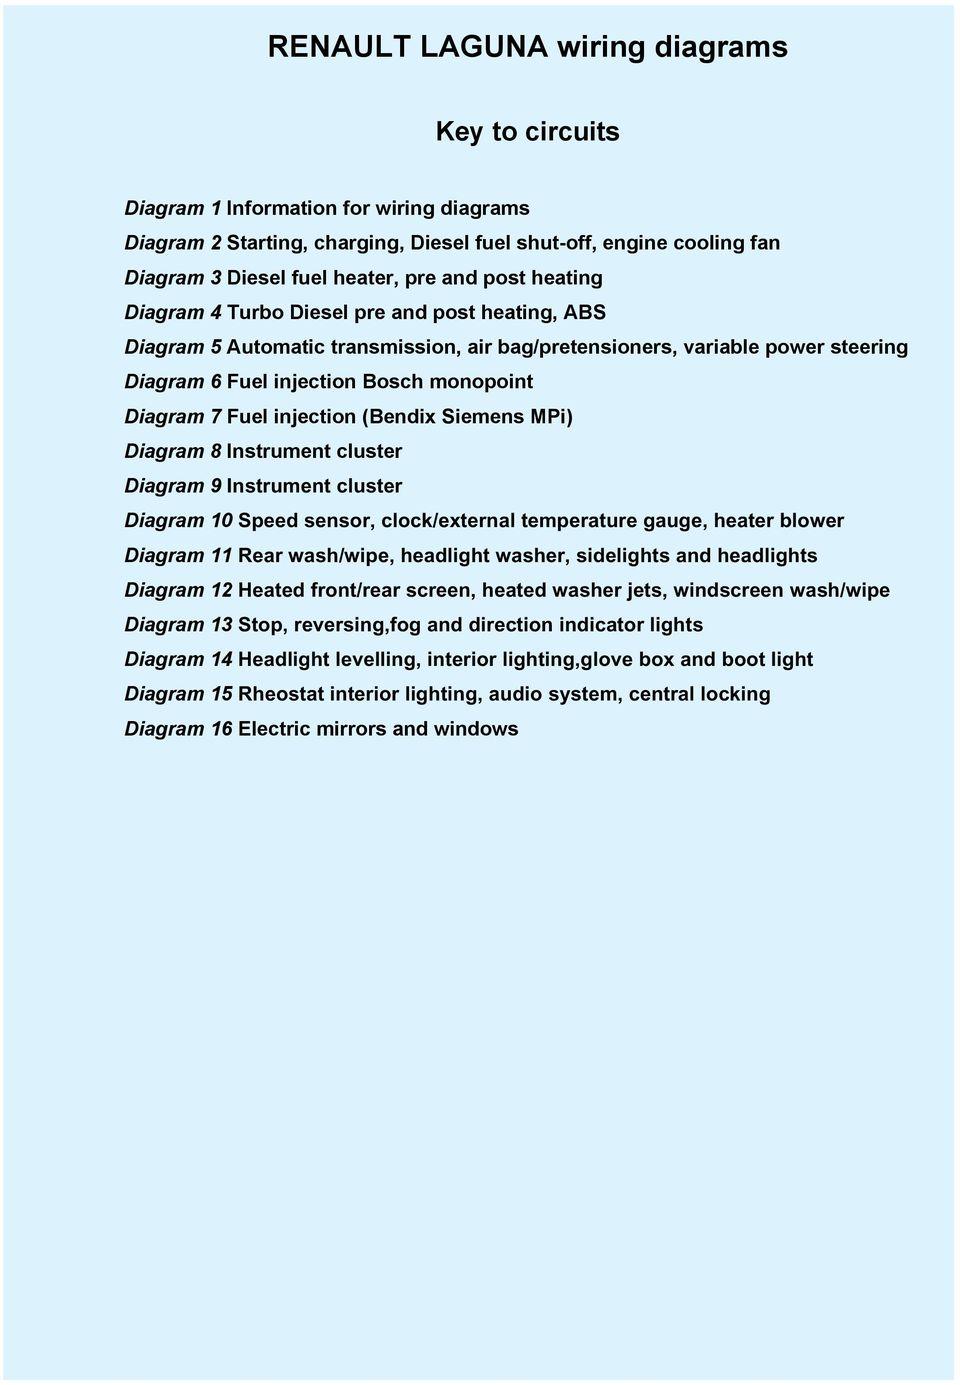 hight resolution of renault laguna wiring diagram wiring diagram meta renault laguna 1 wiring diagrams pdf renault laguna i wiring diagram